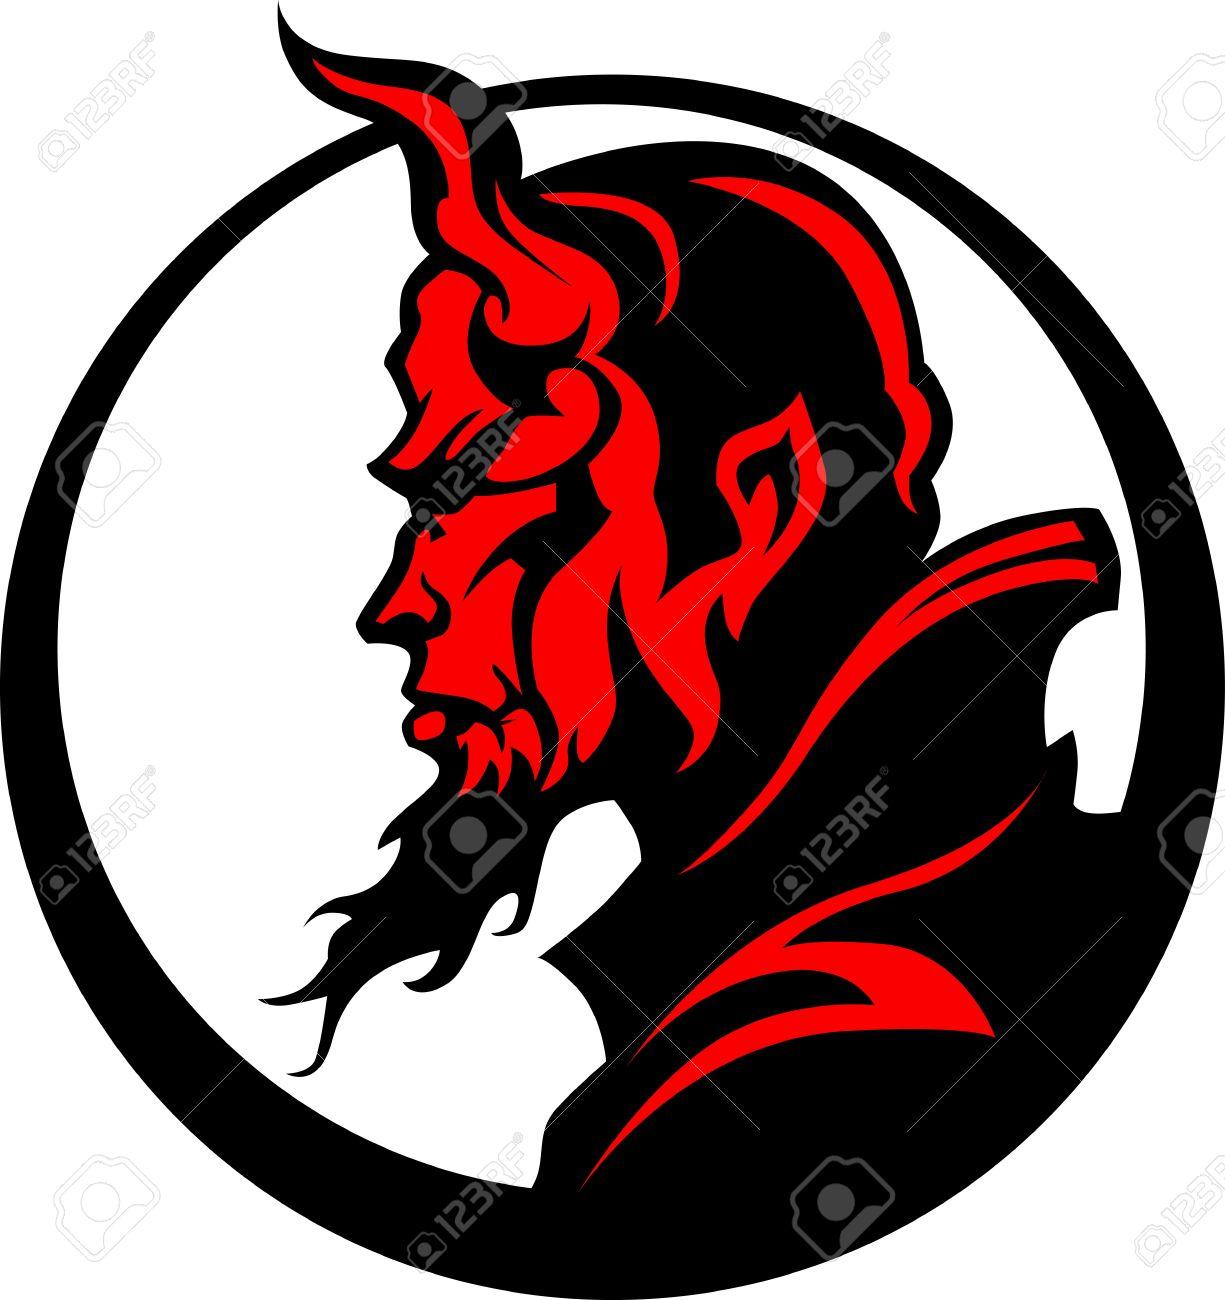 70 588 devil stock vector illustration and royalty free devil clipart rh 123rf com devil clip art free download devil clipart for vinyl cutters